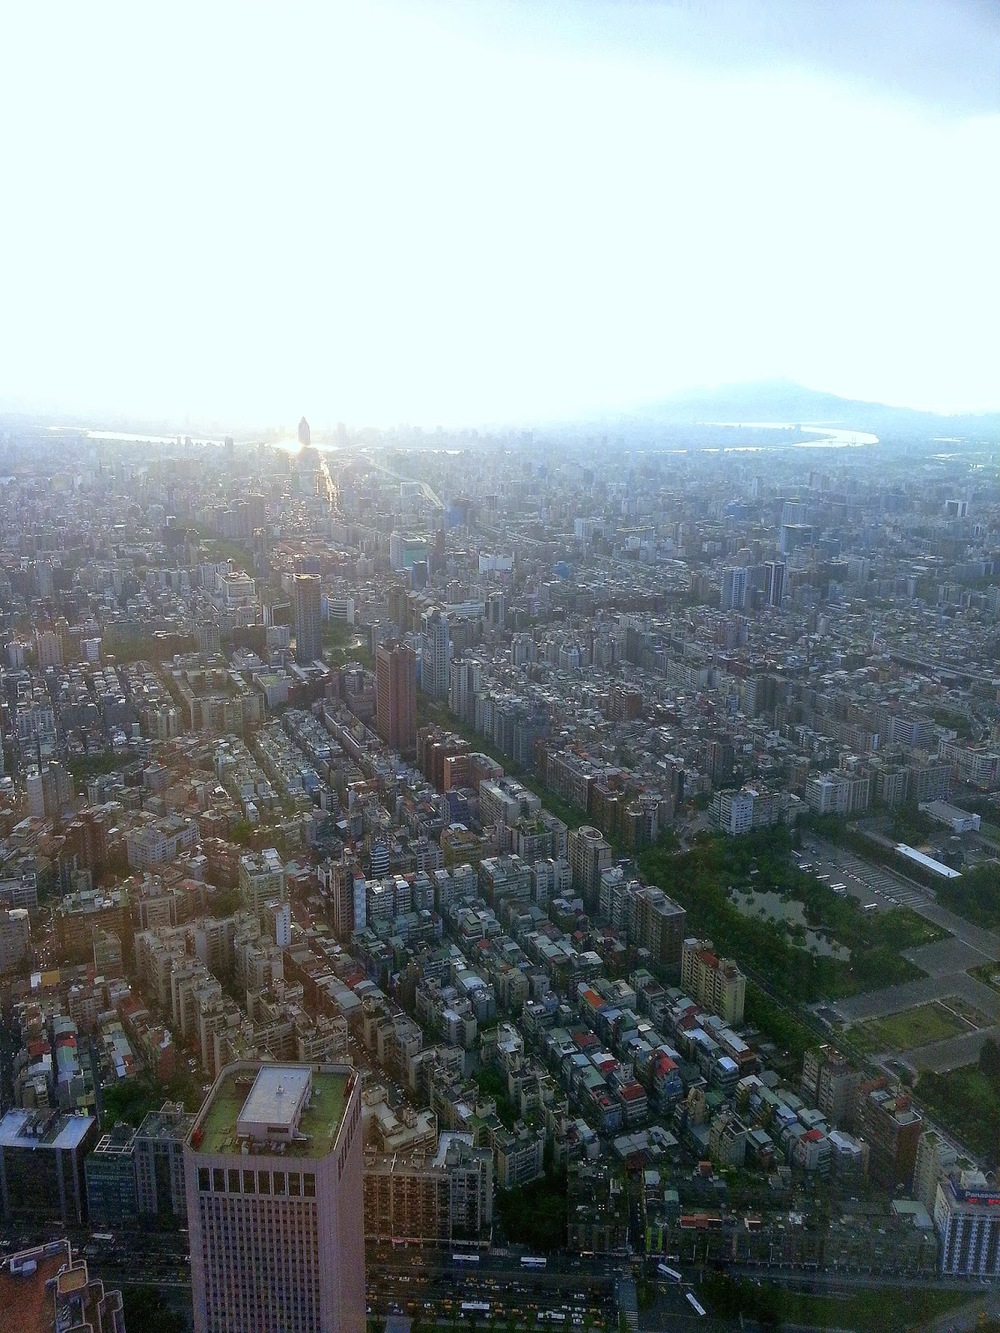 Taiwan%2BTaipei%2B101%2BSkycraper%2BTop2.jpg